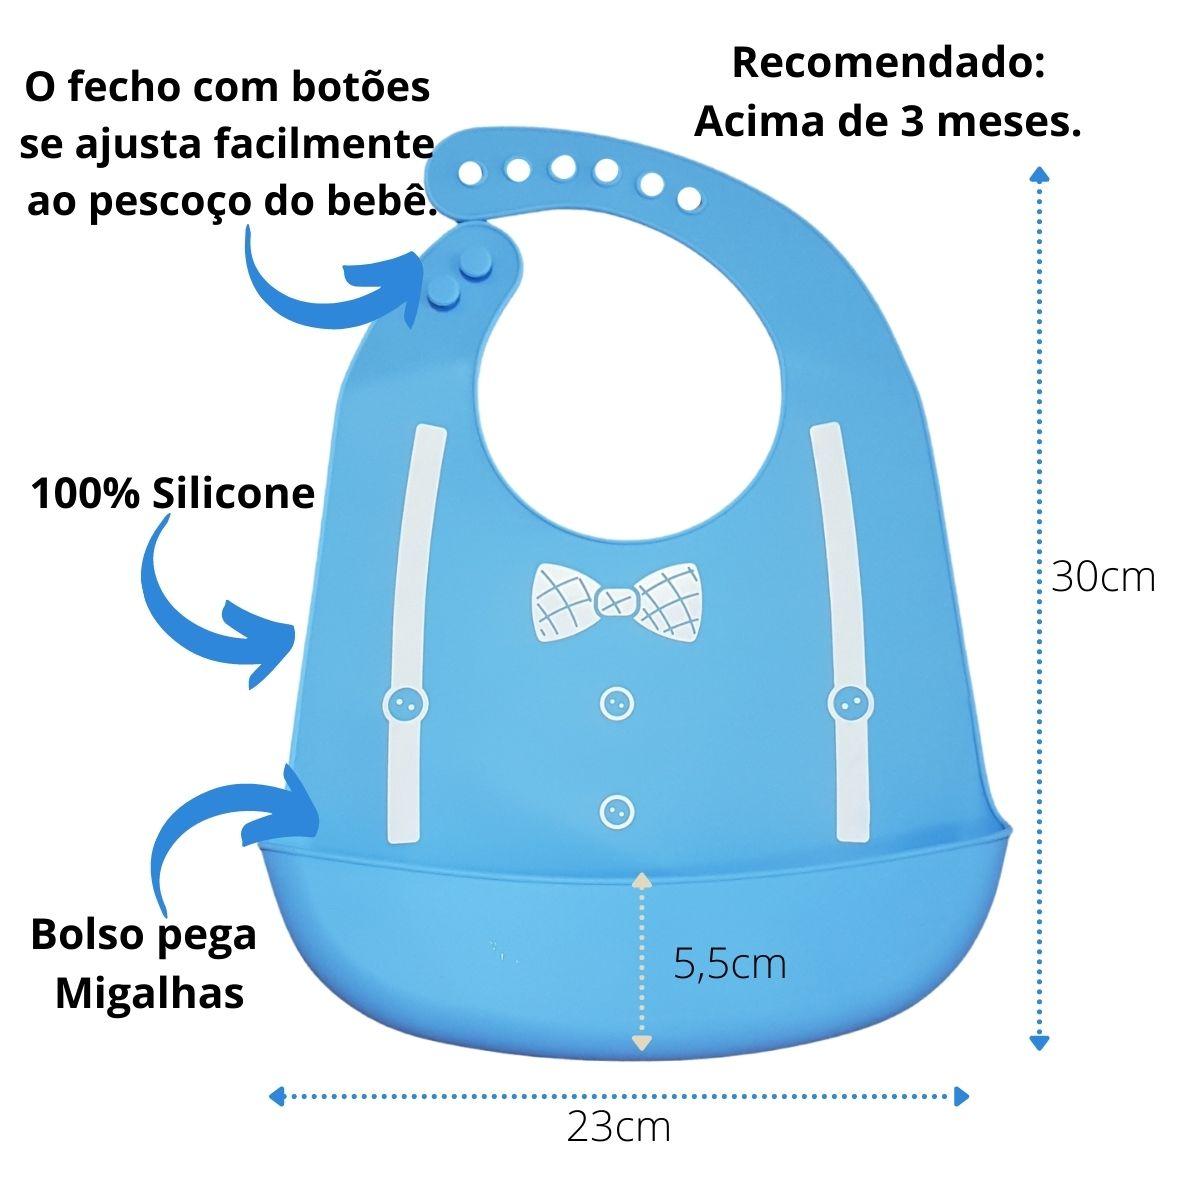 Babador De Silicone Com Pega Migalhas Azul Buba Baby